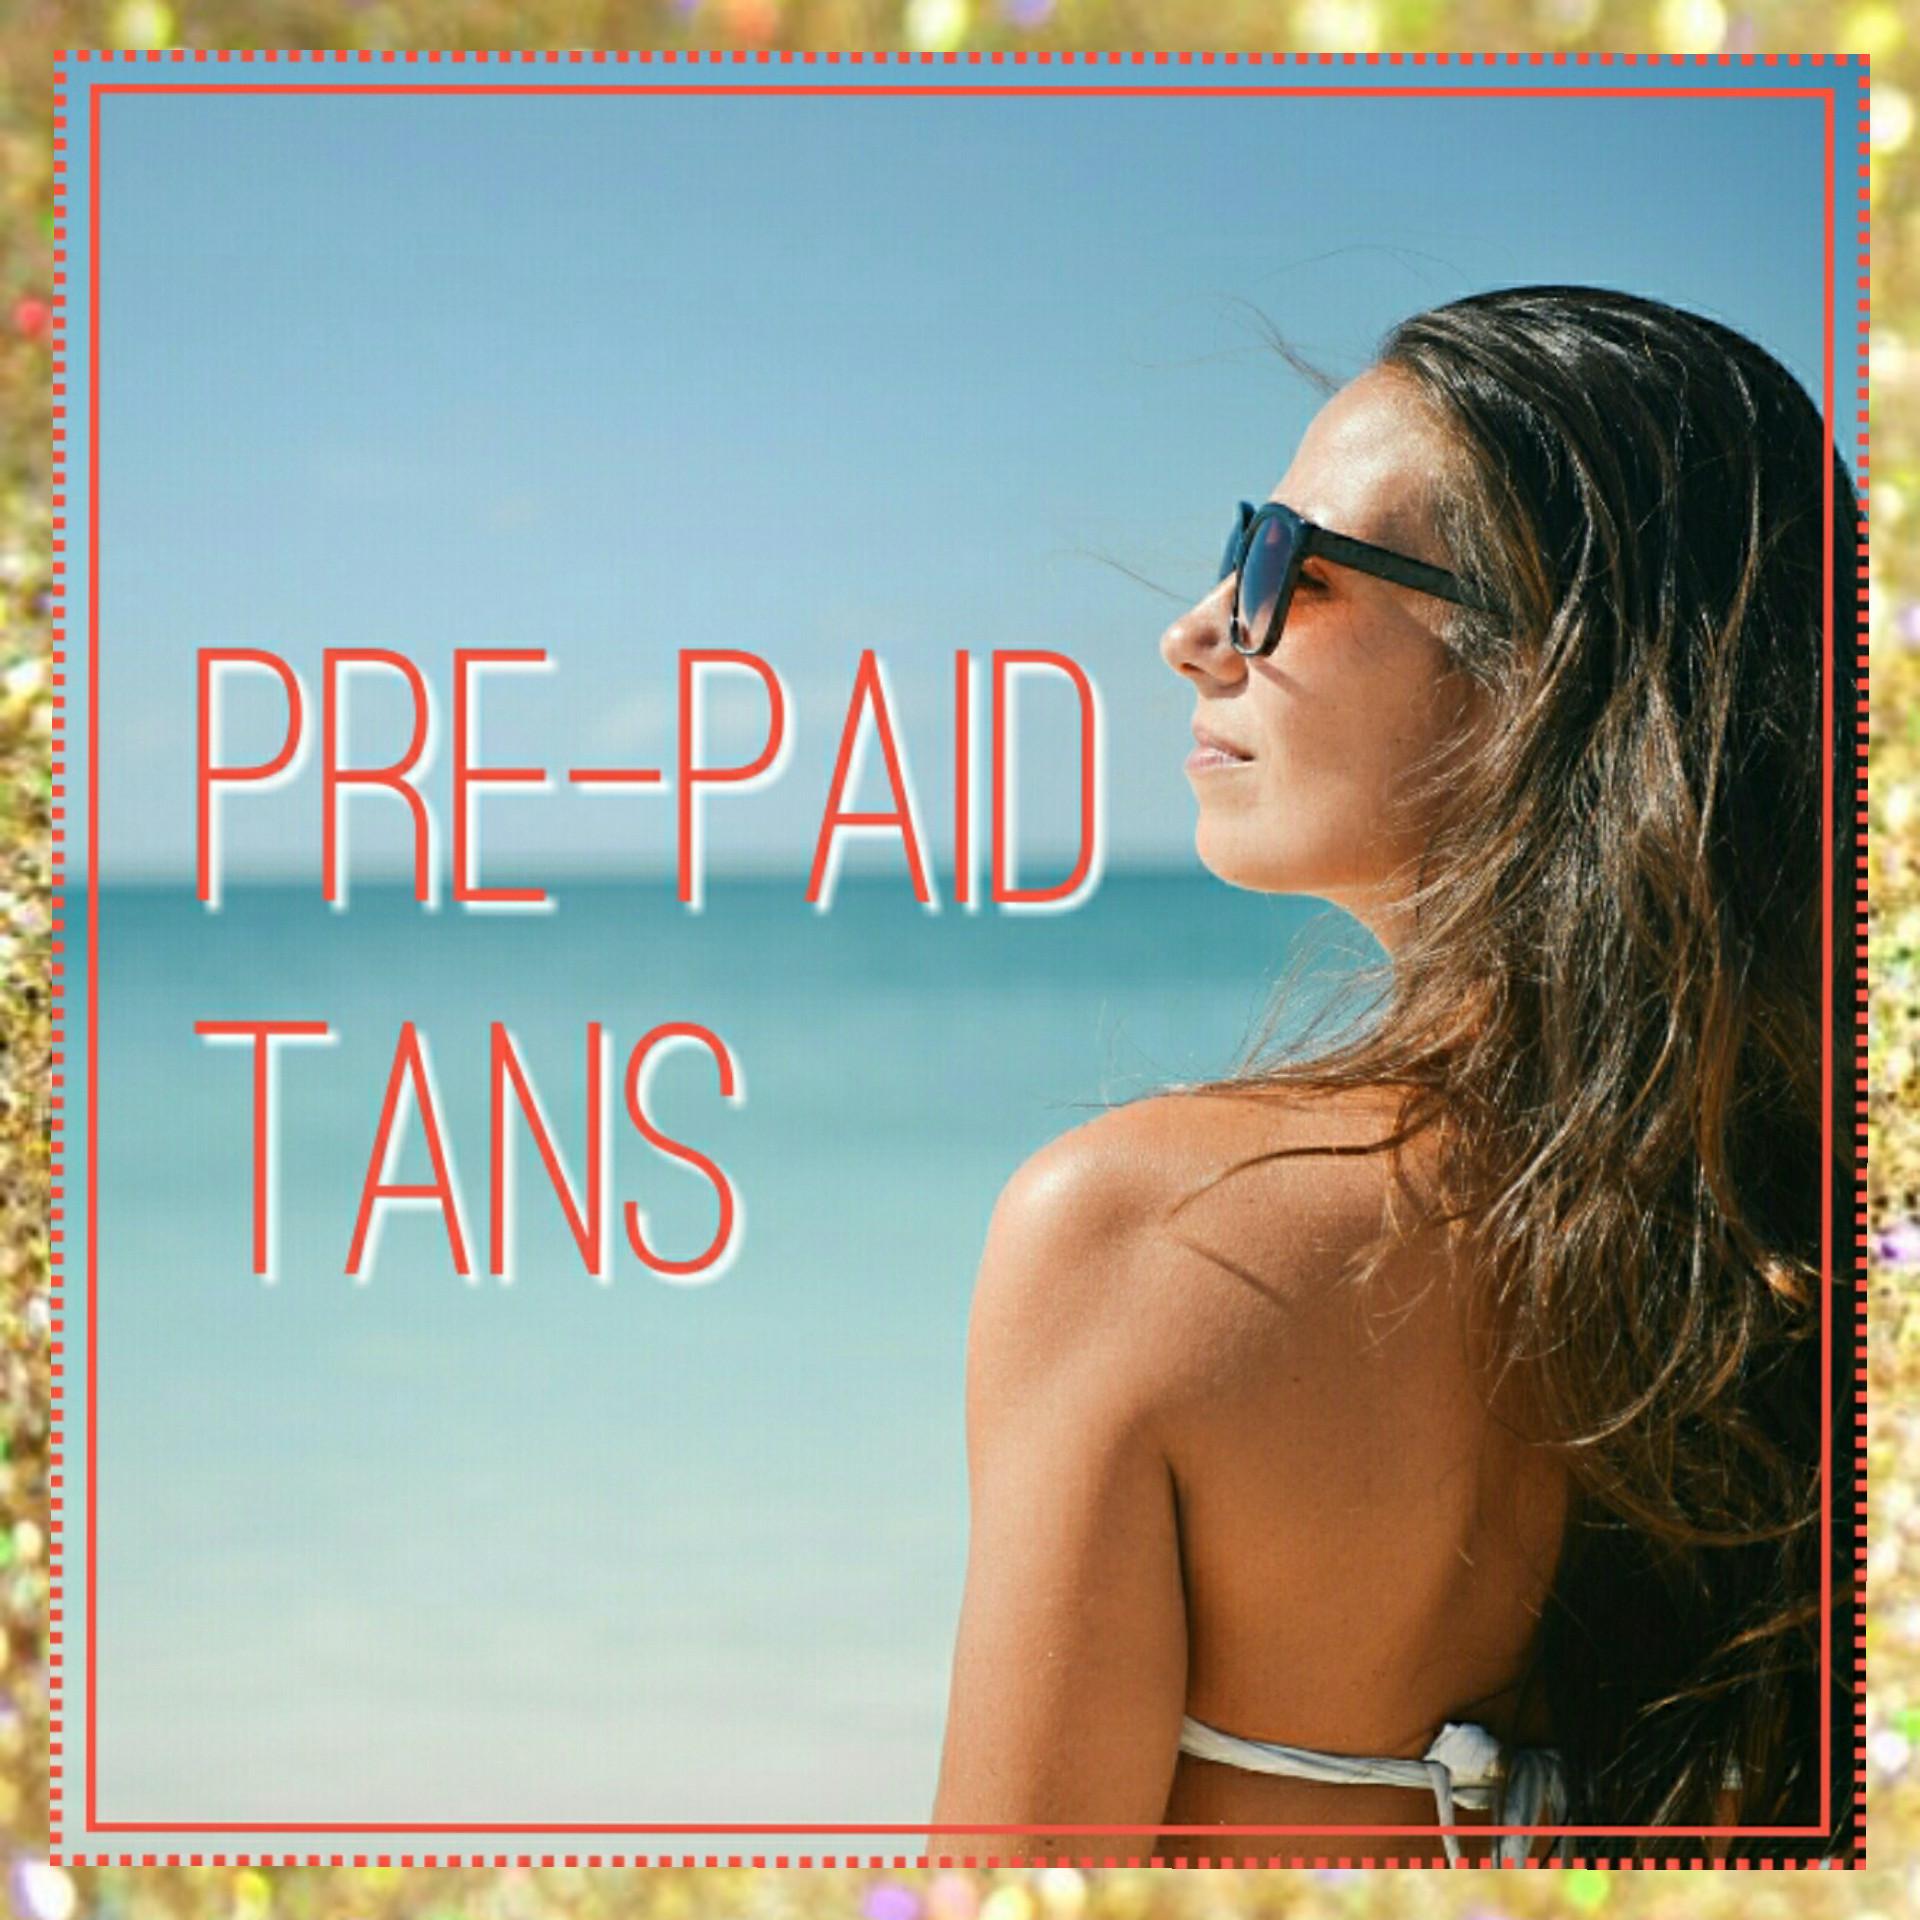 Spray Tan using Pre-Purchased Pass